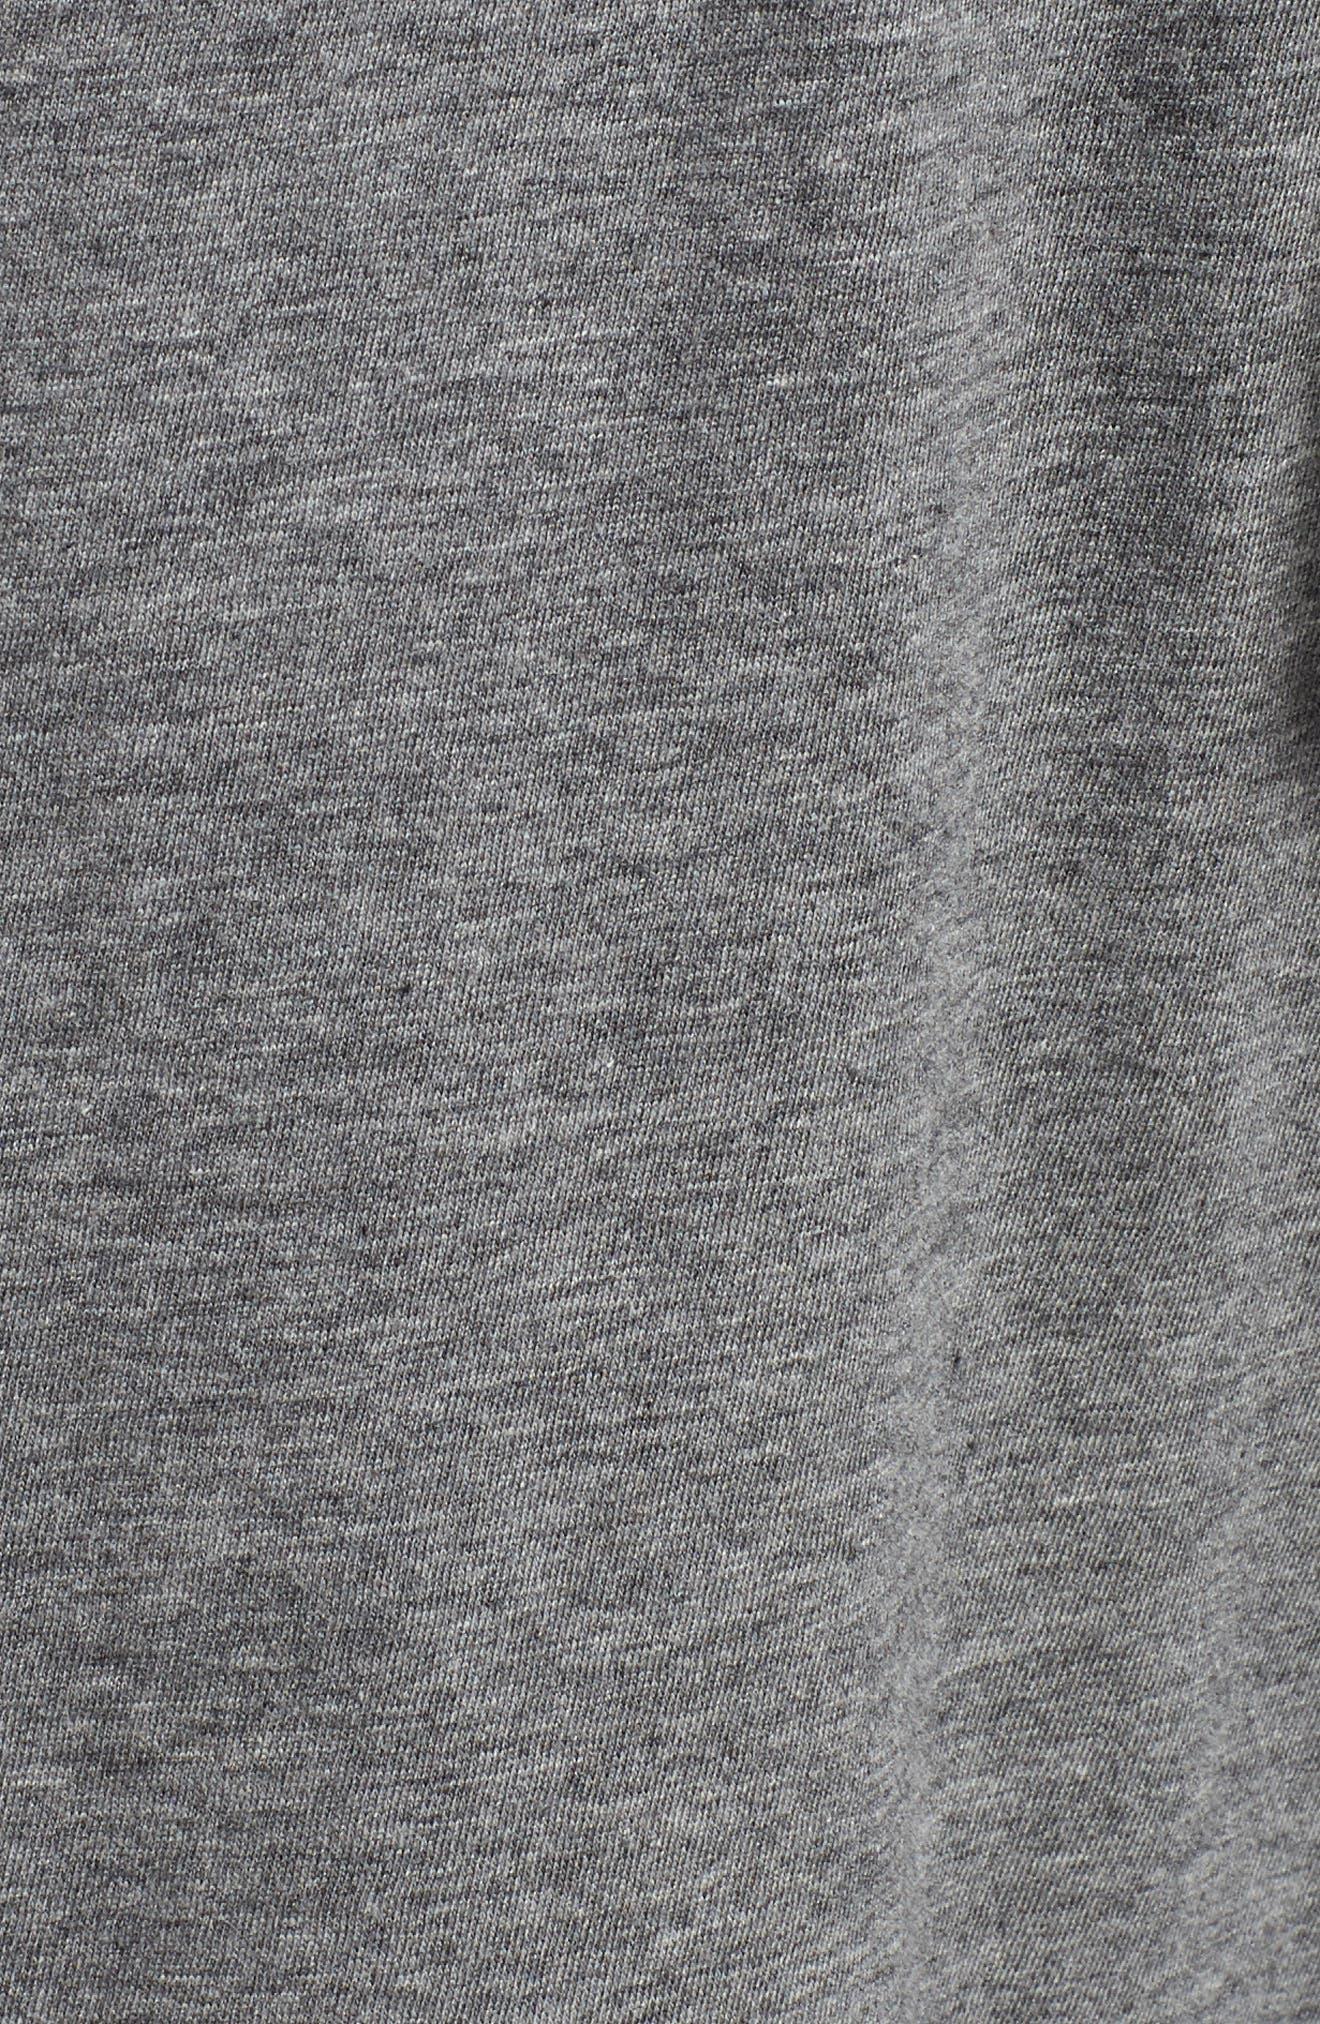 Pima Cotton Lounge Shorts,                             Alternate thumbnail 5, color,                             CHARCOAL HEATHER